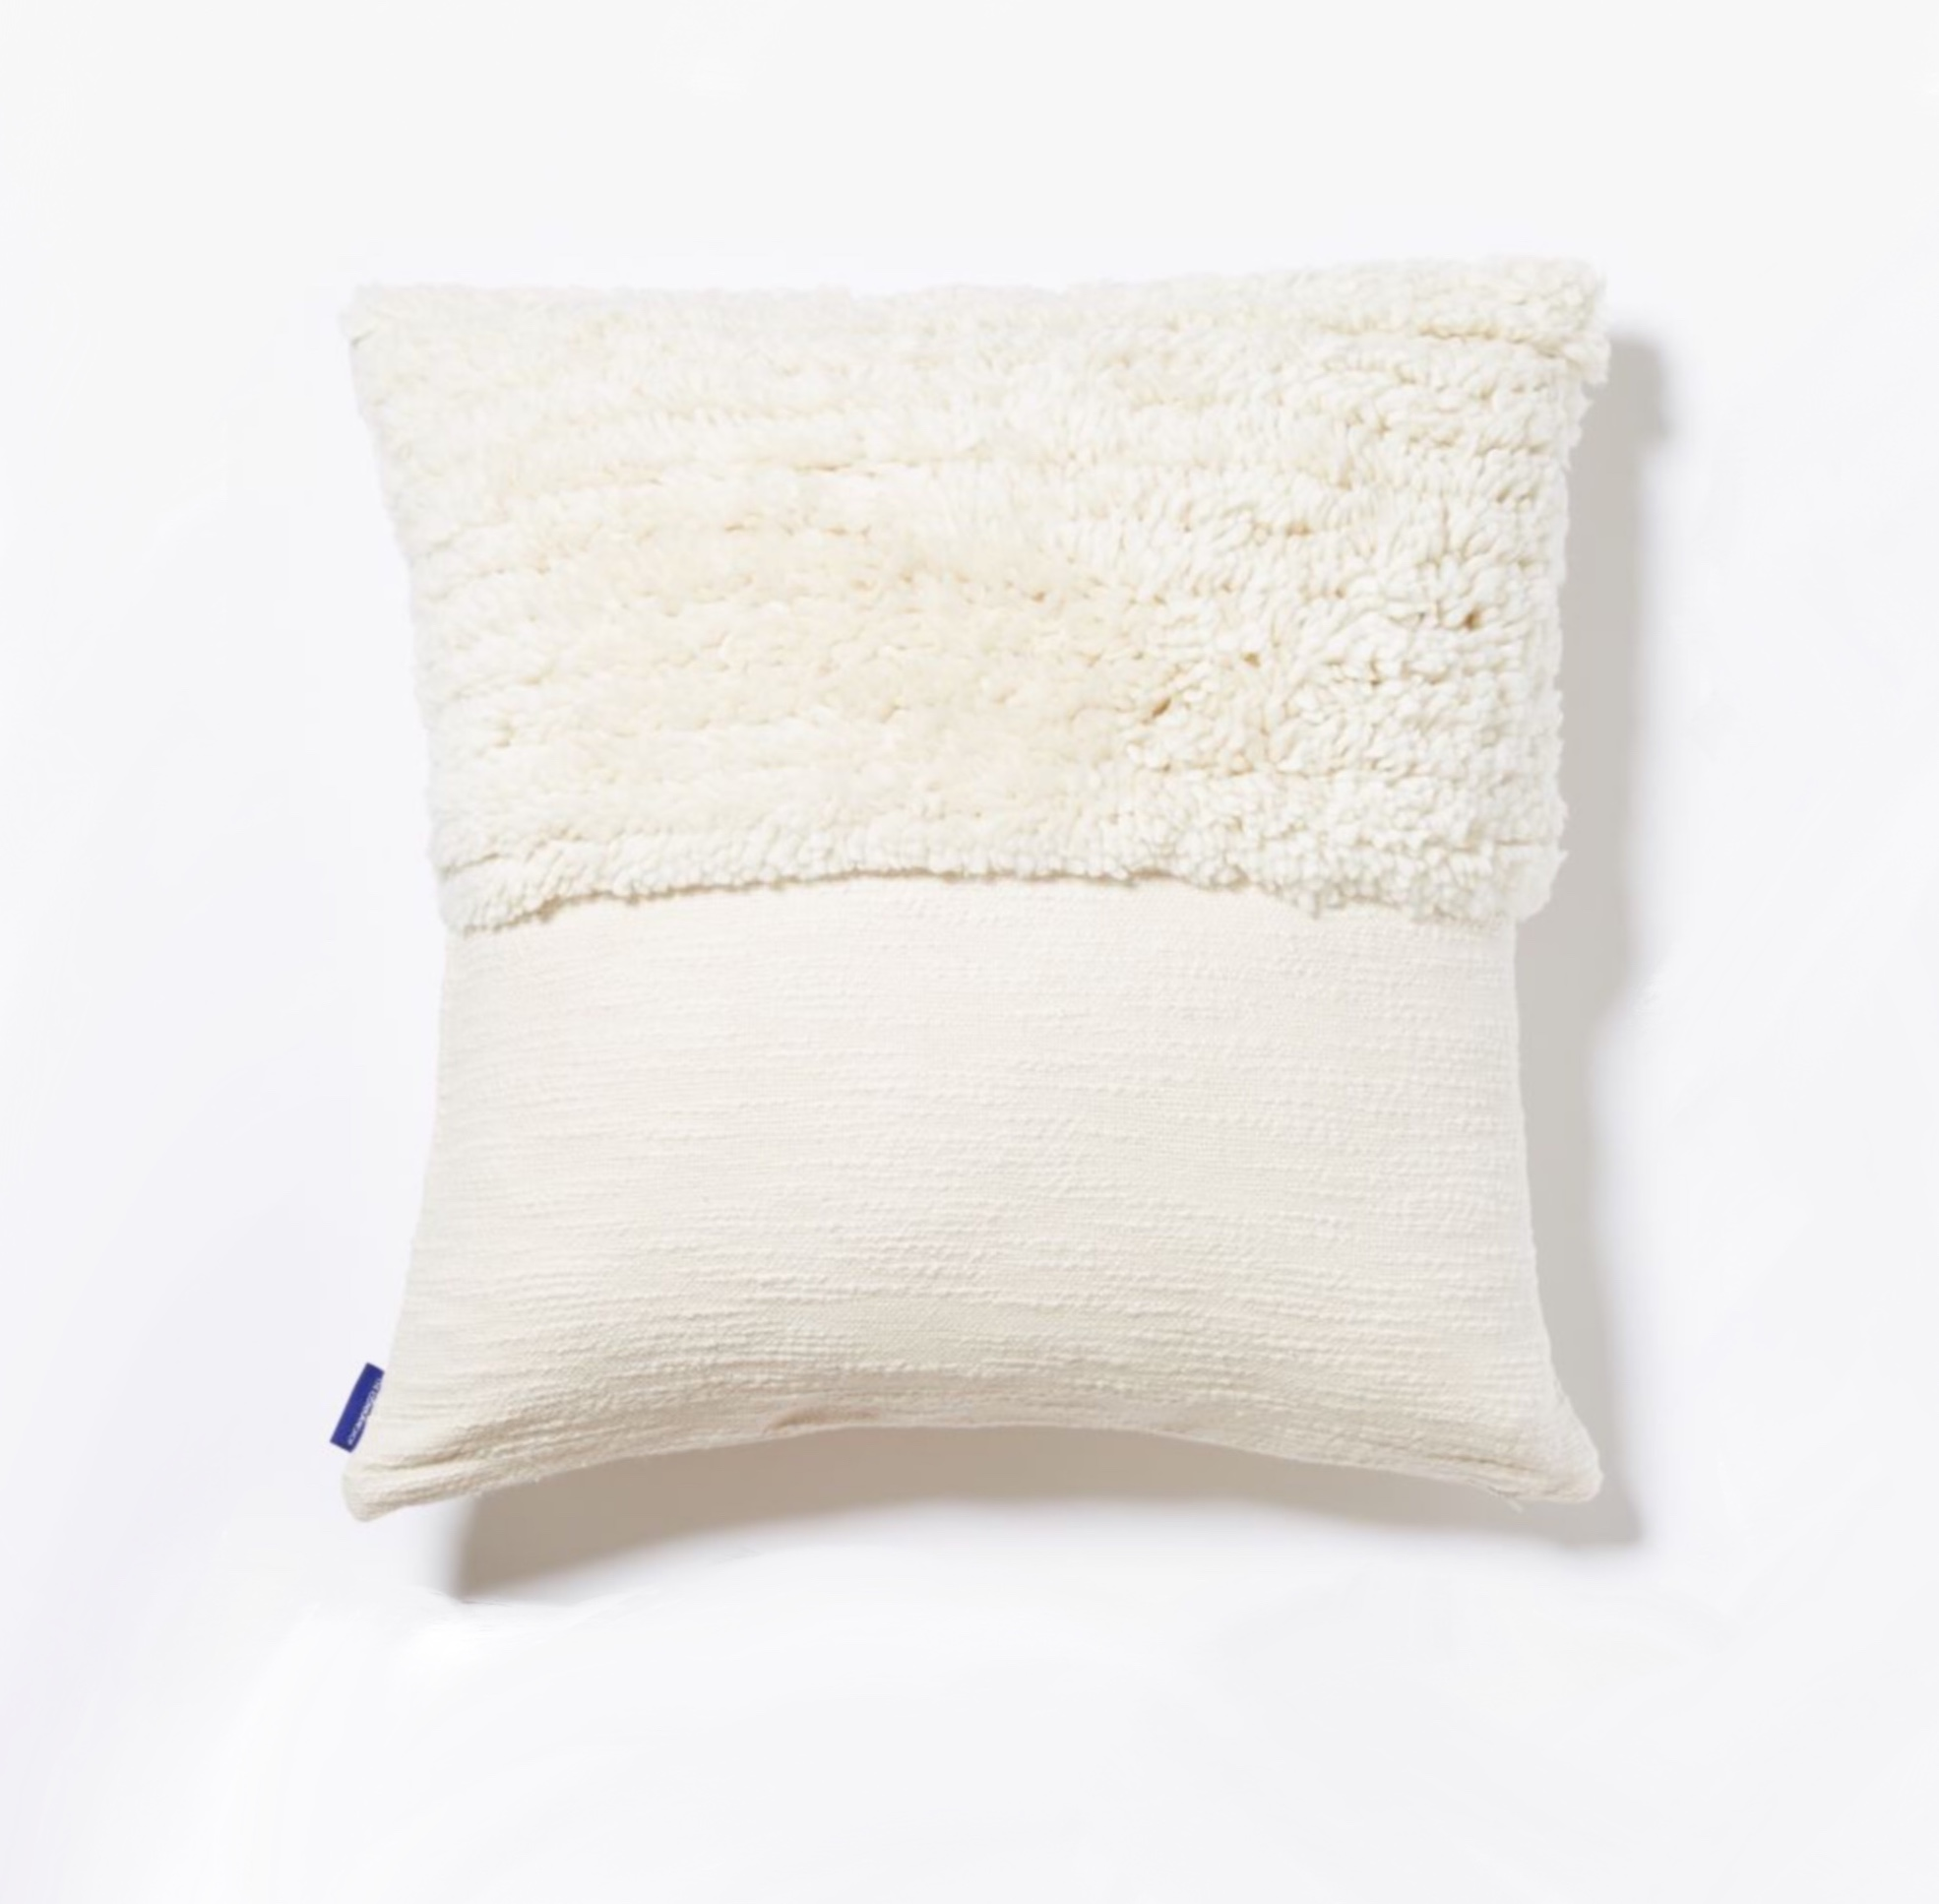 shite block shapes cushion cover